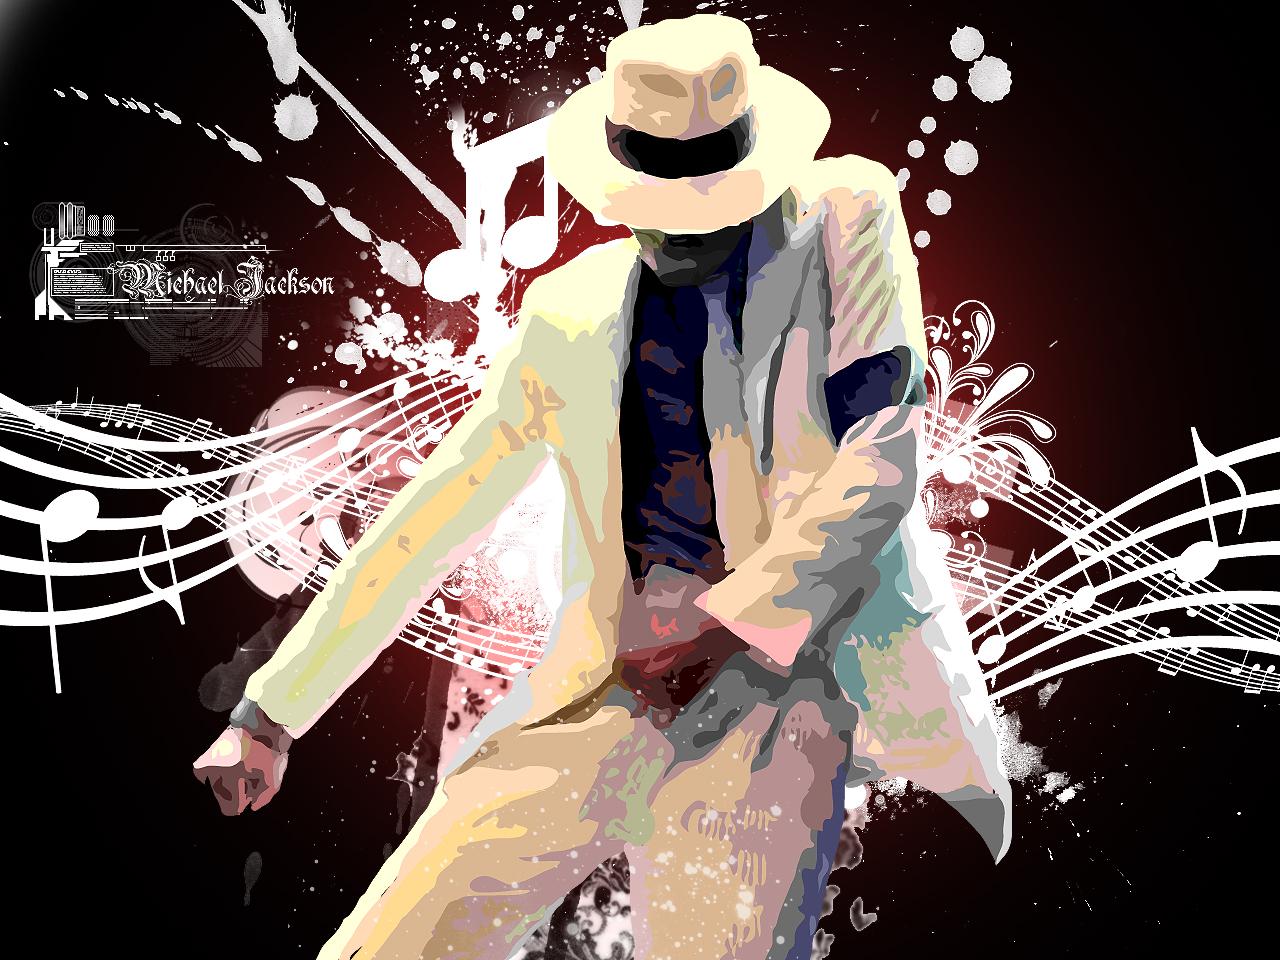 http://1.bp.blogspot.com/-vNzbcBrCwBo/Ti0xWbh8PSI/AAAAAAAAAR8/GsVSX6MtmpU/s1600/michael_jackson_rock_dance-wallpapers%2540lahari.net.jpg